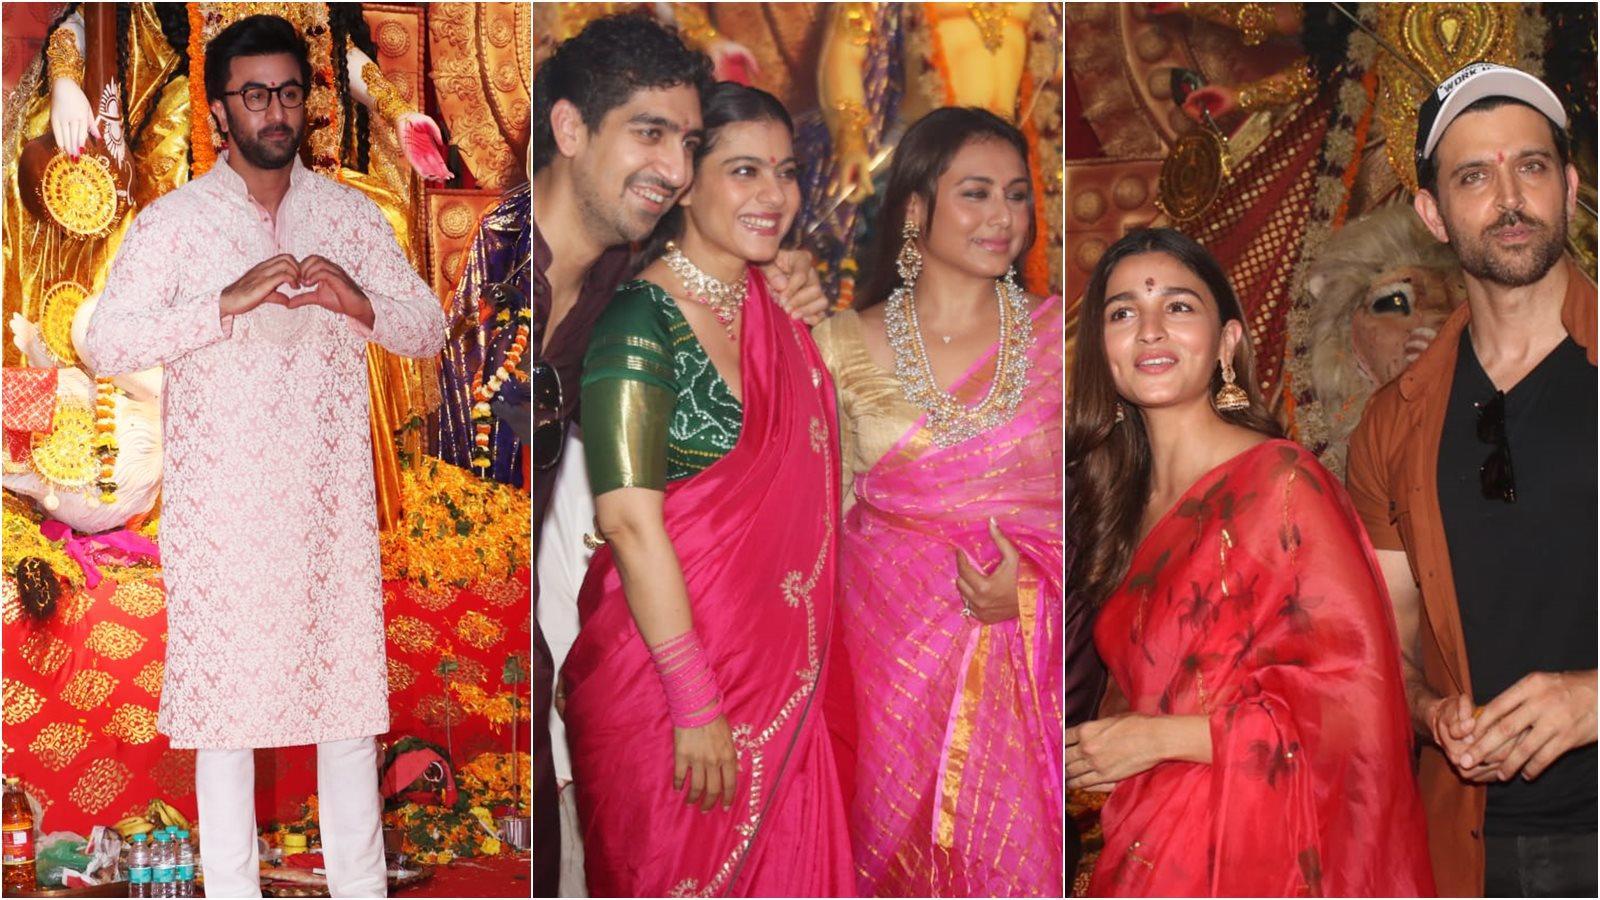 Durga Puja: Alia Bhatt, Ranbir Kapoor, Hritik Roshan and Ayan Mukerji join Kajol for celebrations